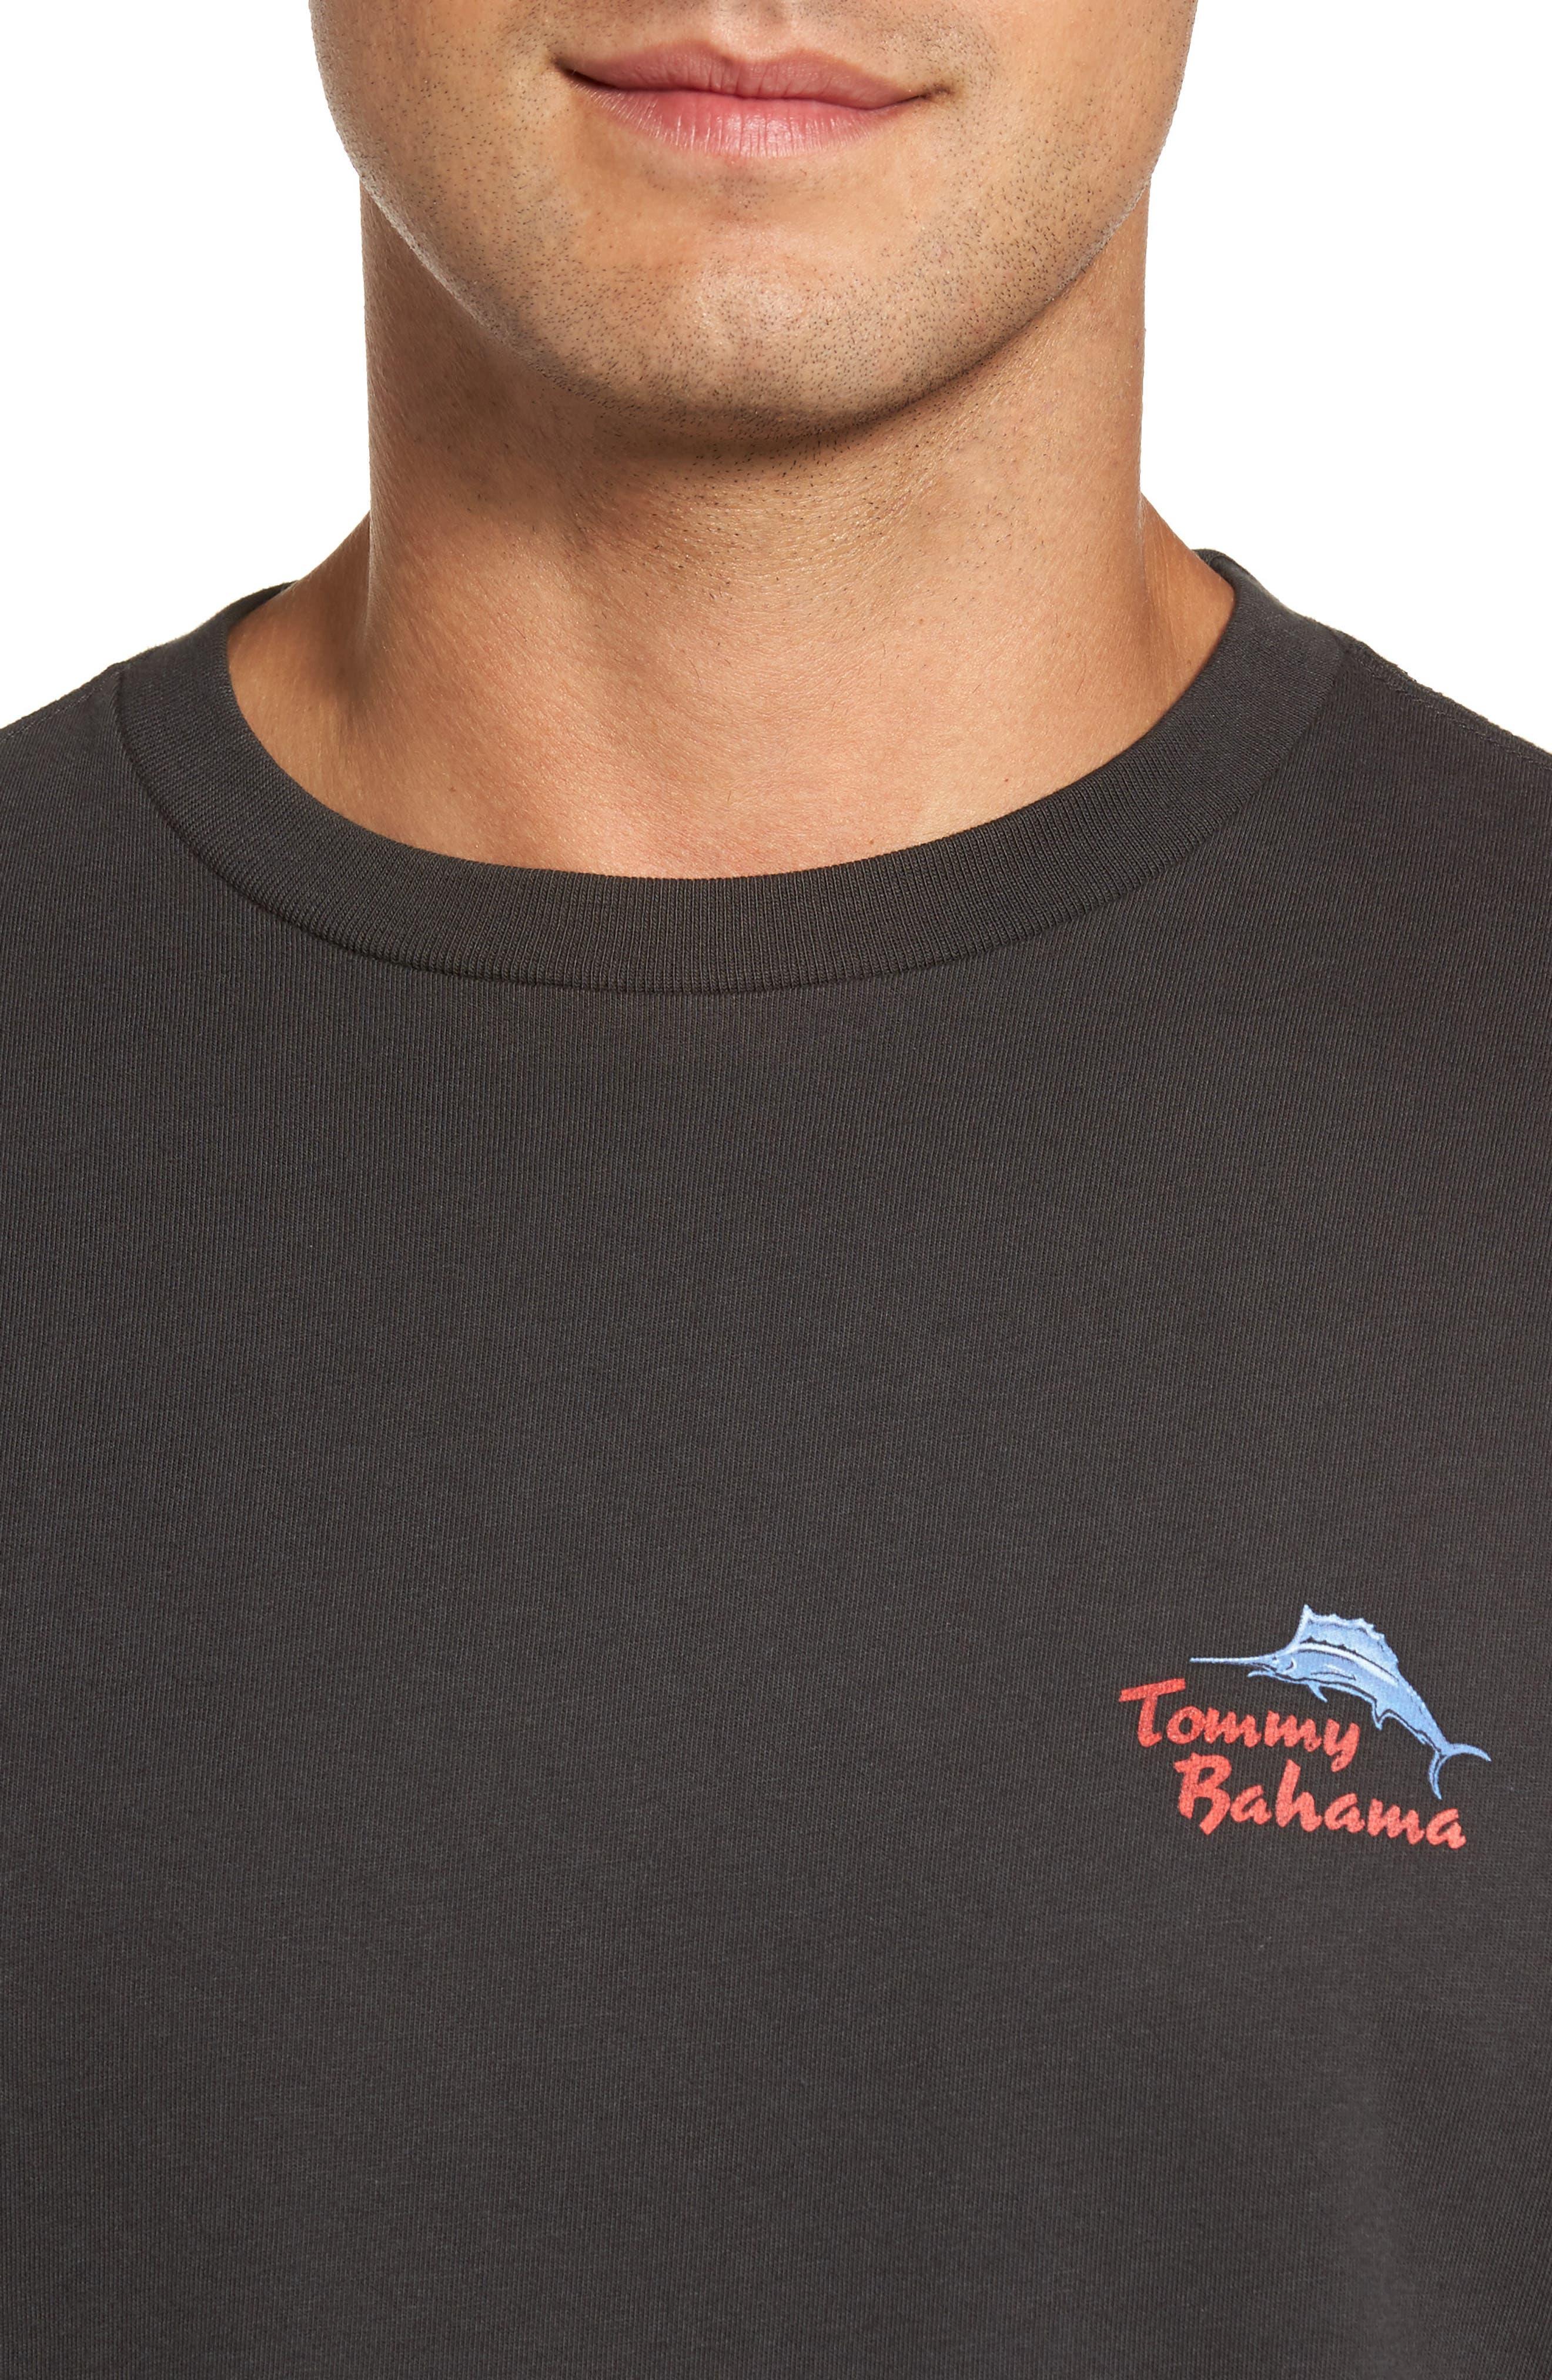 Gulp Fiction T-Shirt,                             Alternate thumbnail 4, color,                             001